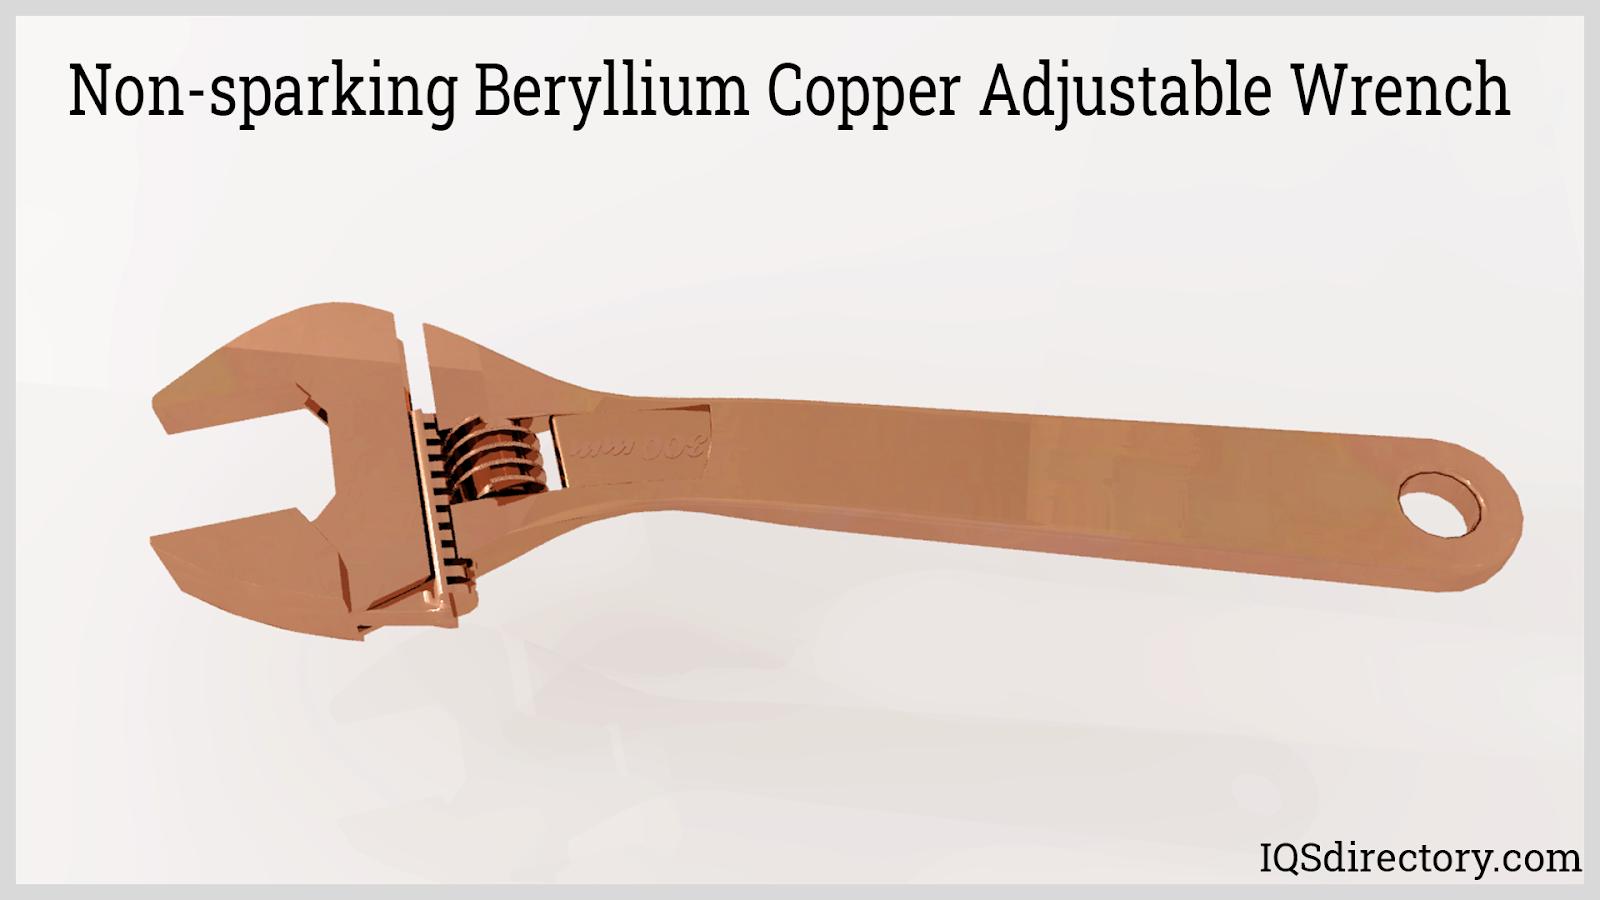 Non-sparking Beryllium Copper Adjustable Wrench